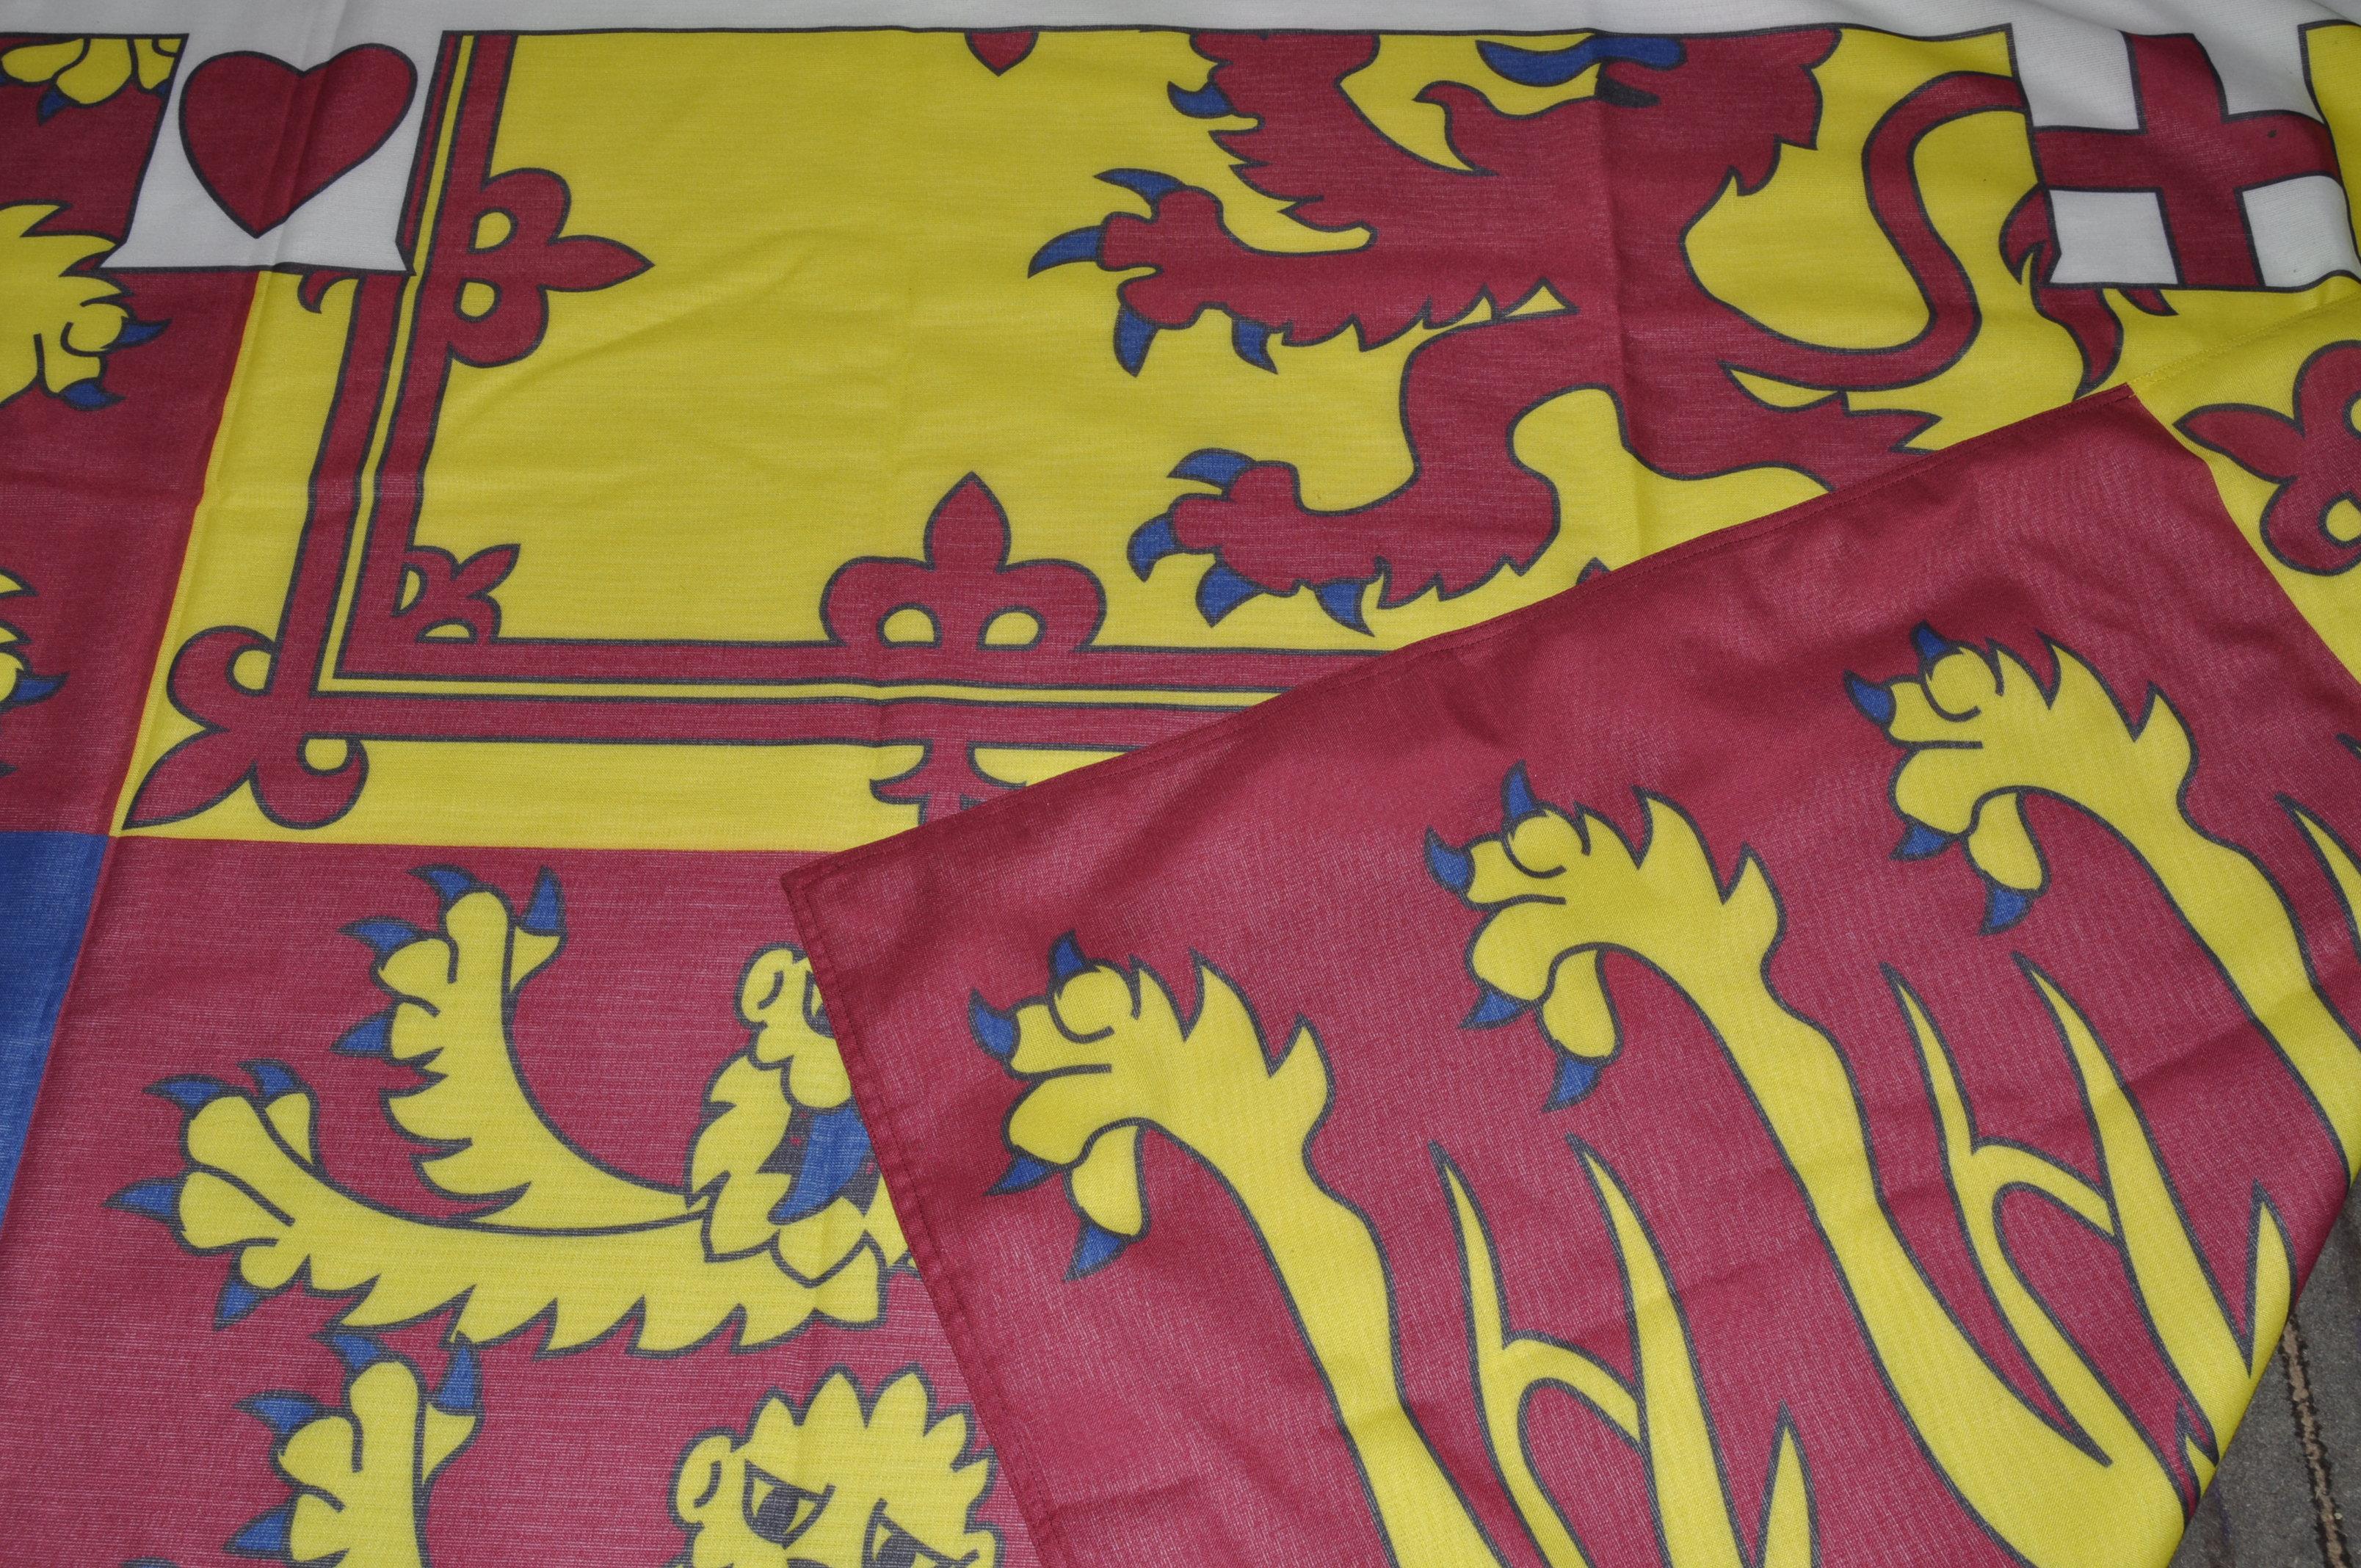 LARGE ROYAL STANDARD OF THE UNITED KINGDOM FLAG - Image 5 of 7